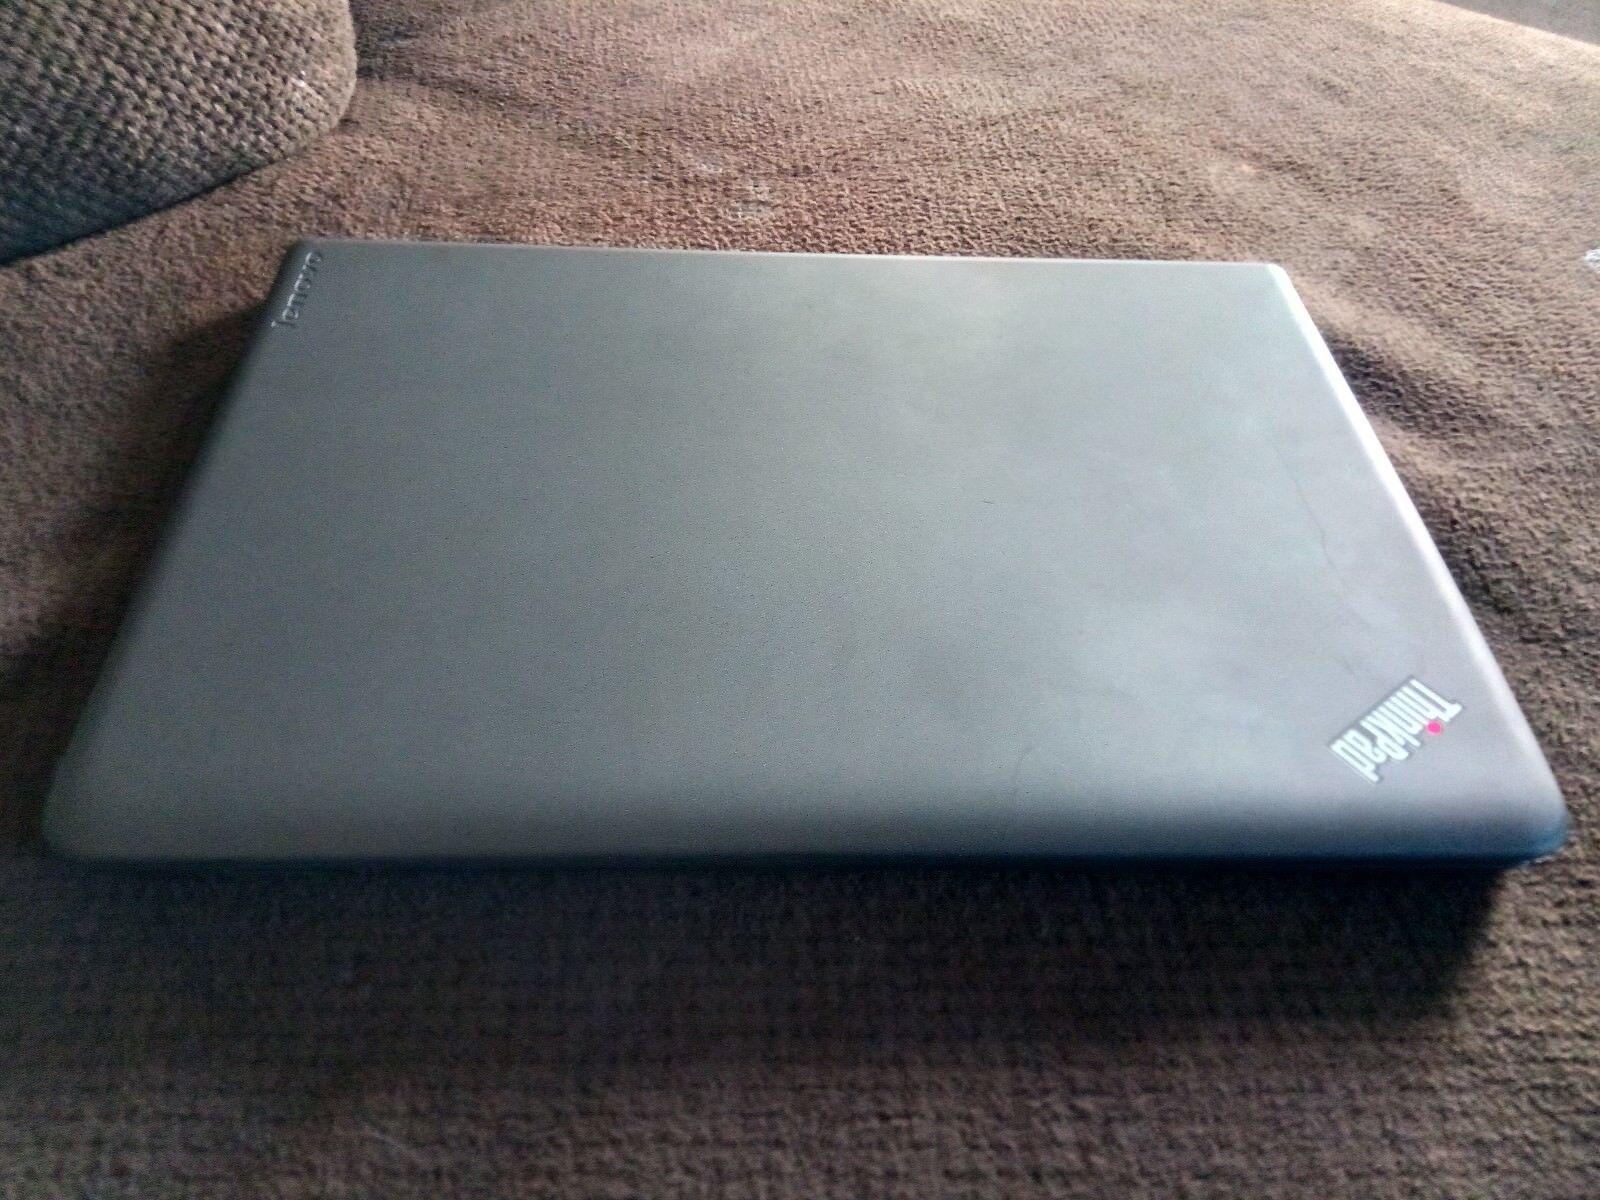 Lenovo Thinkpad E450 Type-20DC004CUIntel Core i5-5200U Processor (2.20GHz)